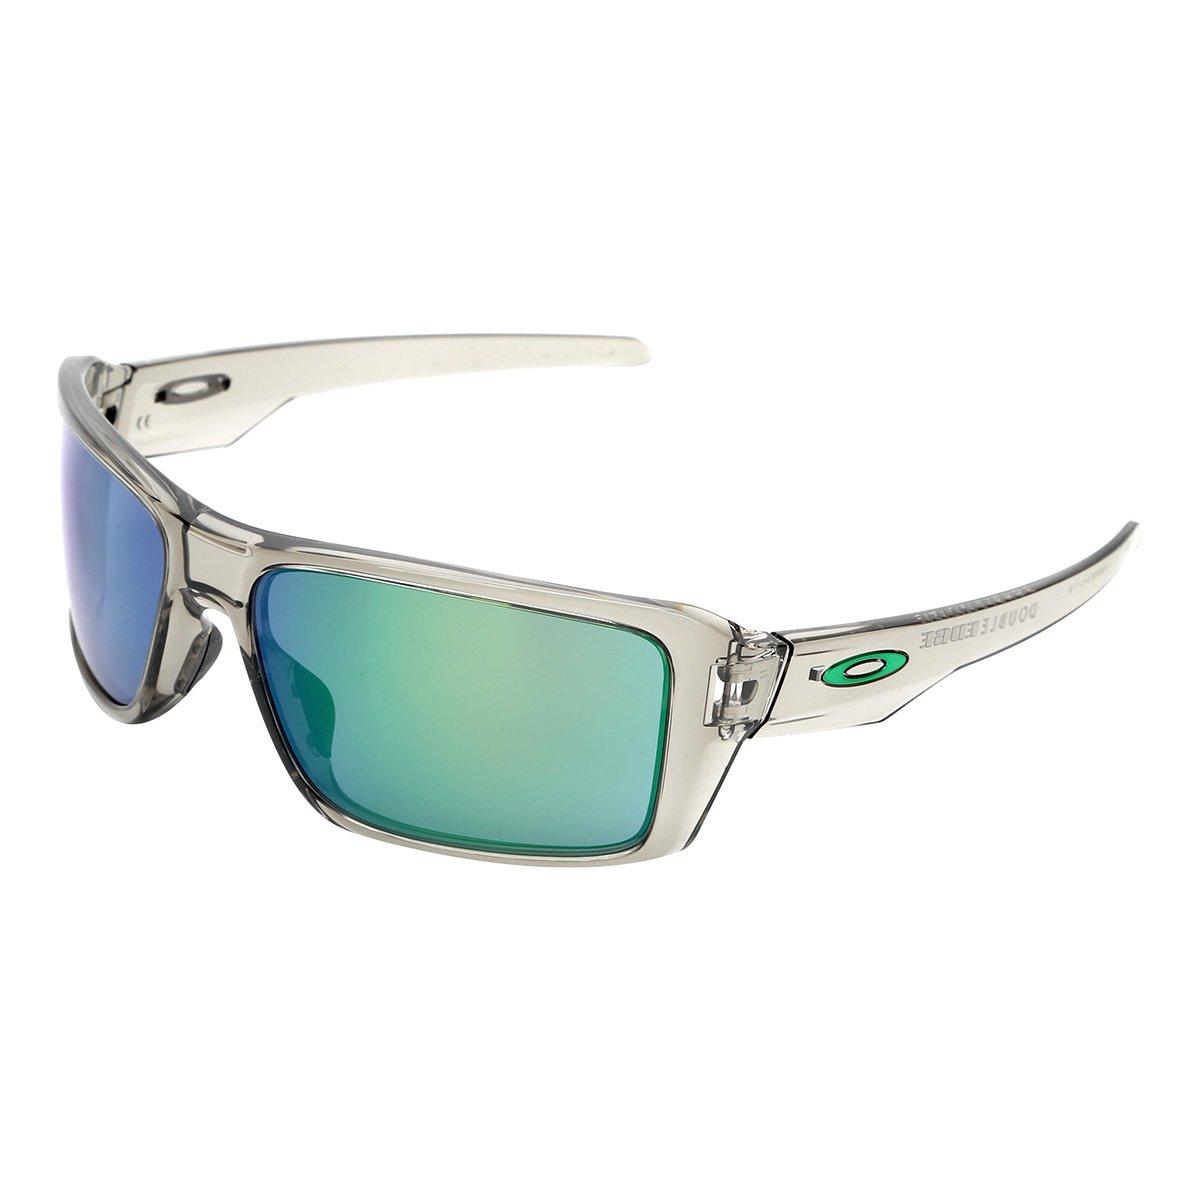 7d7af2ed18604 Óculos de Sol Oakley Double Edge Masculino - Compre Agora